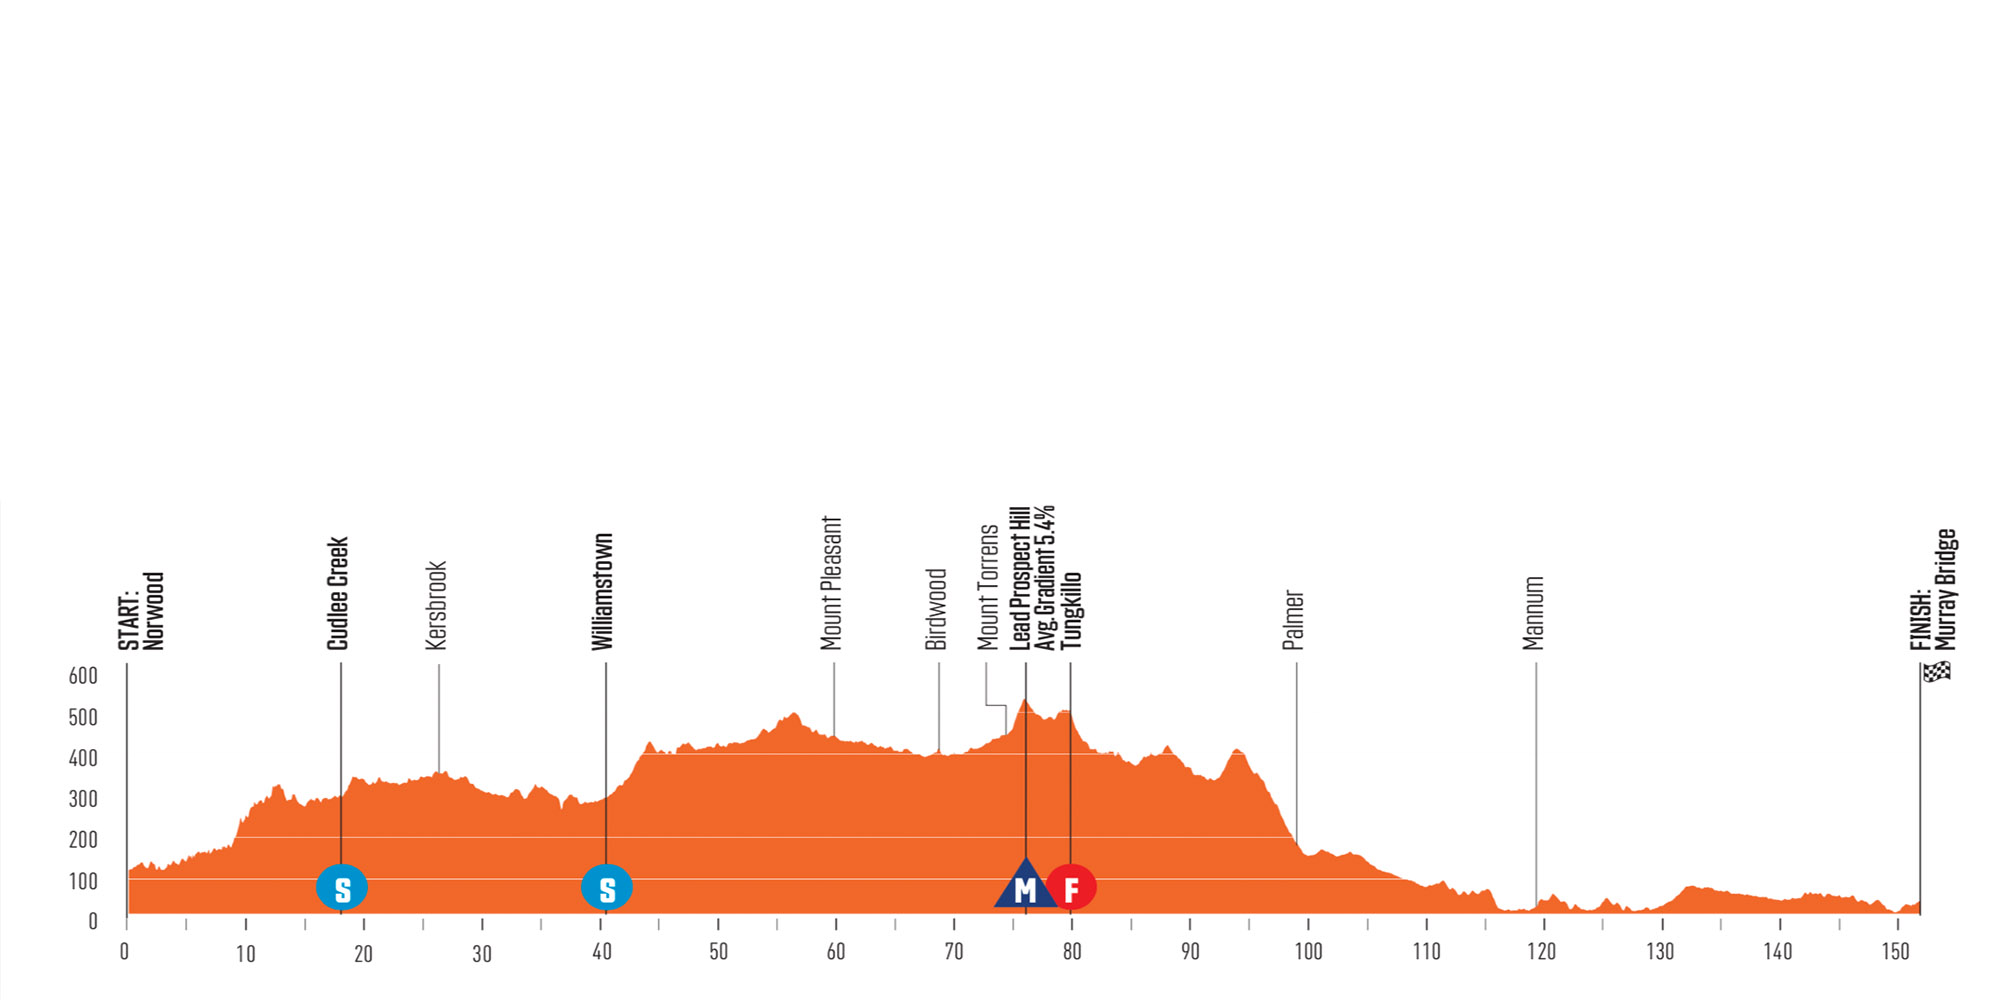 Perfil de la cuarta etapa del Santos Tour Down Under 2020